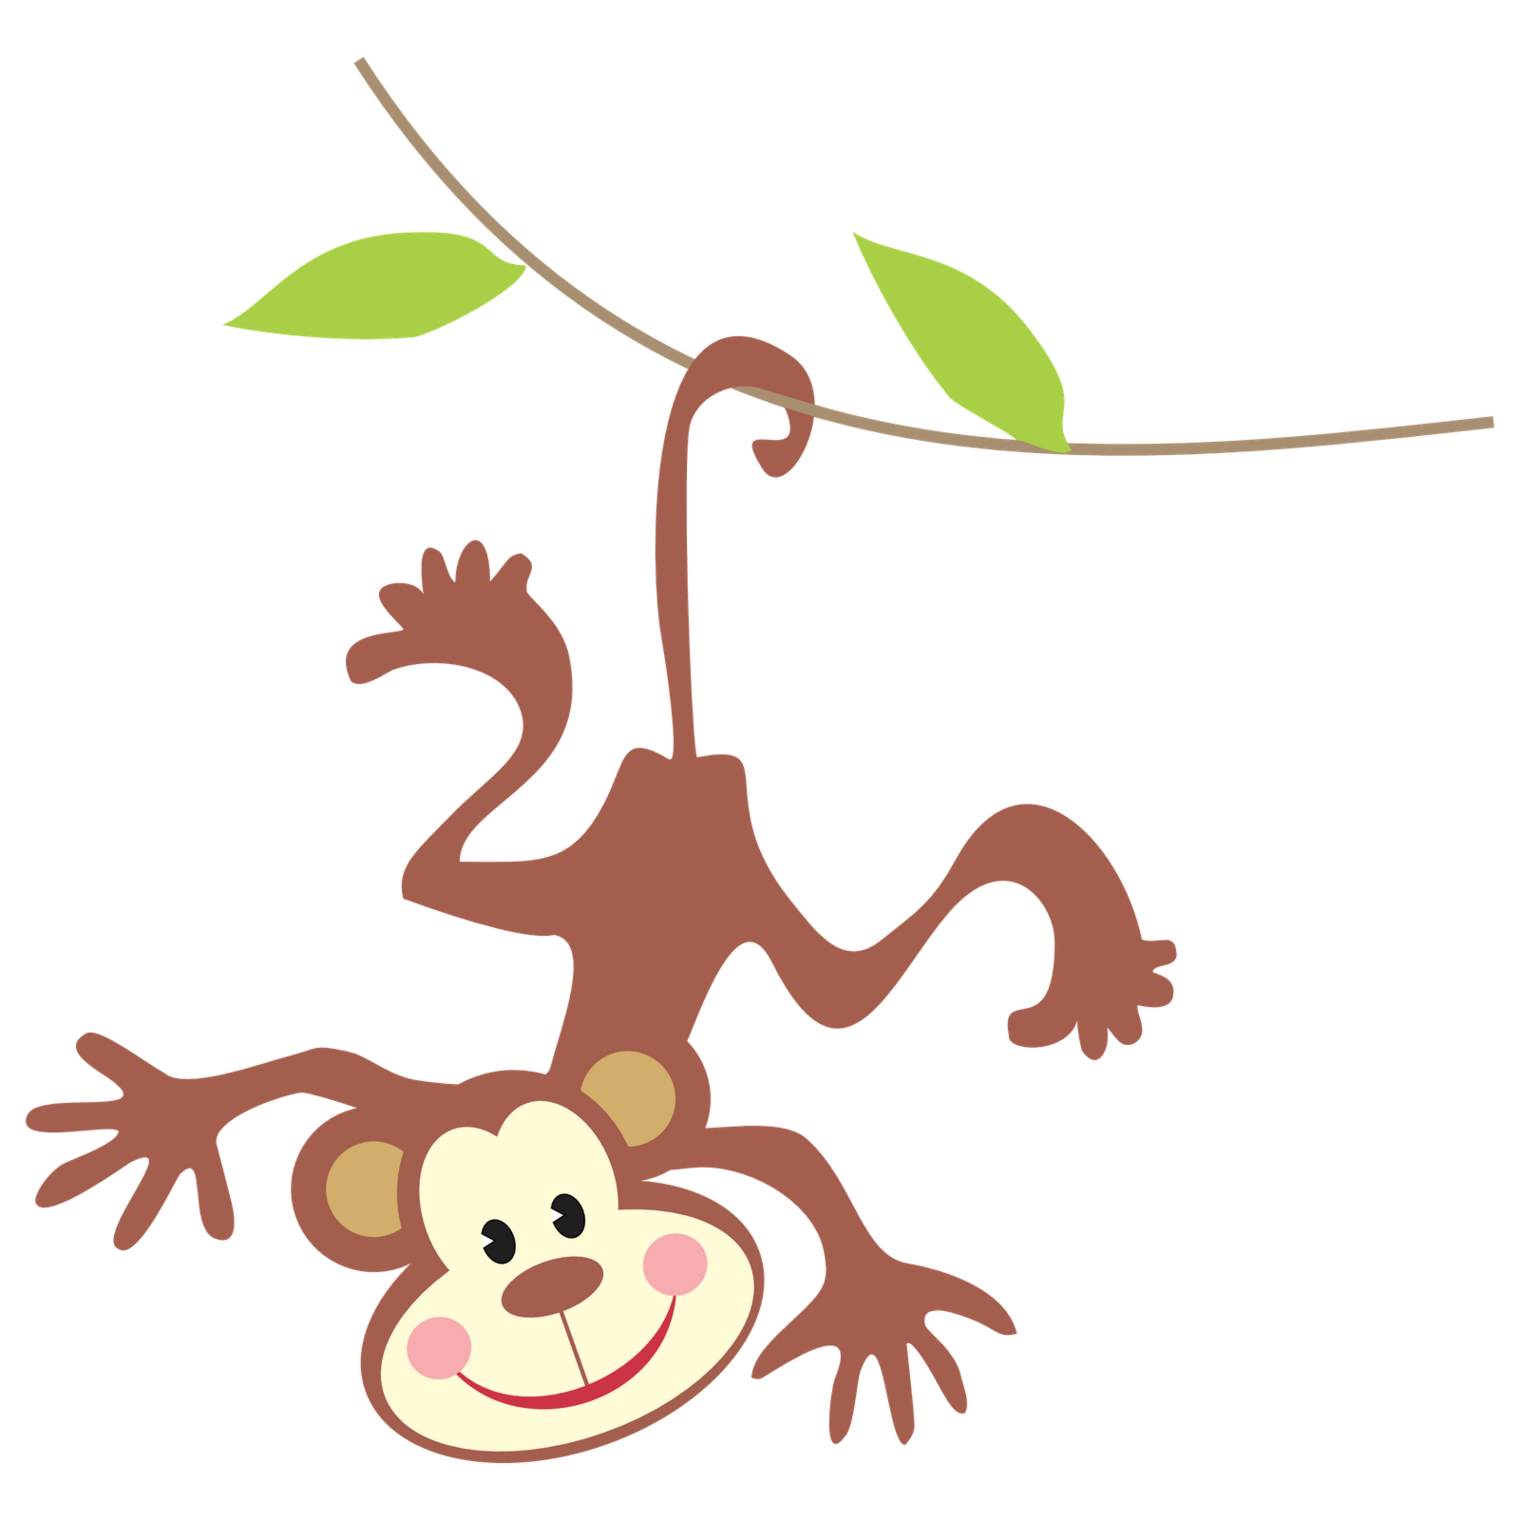 free jungle clip art borders clipart best free clipart jungle borders free clipart jungle animals